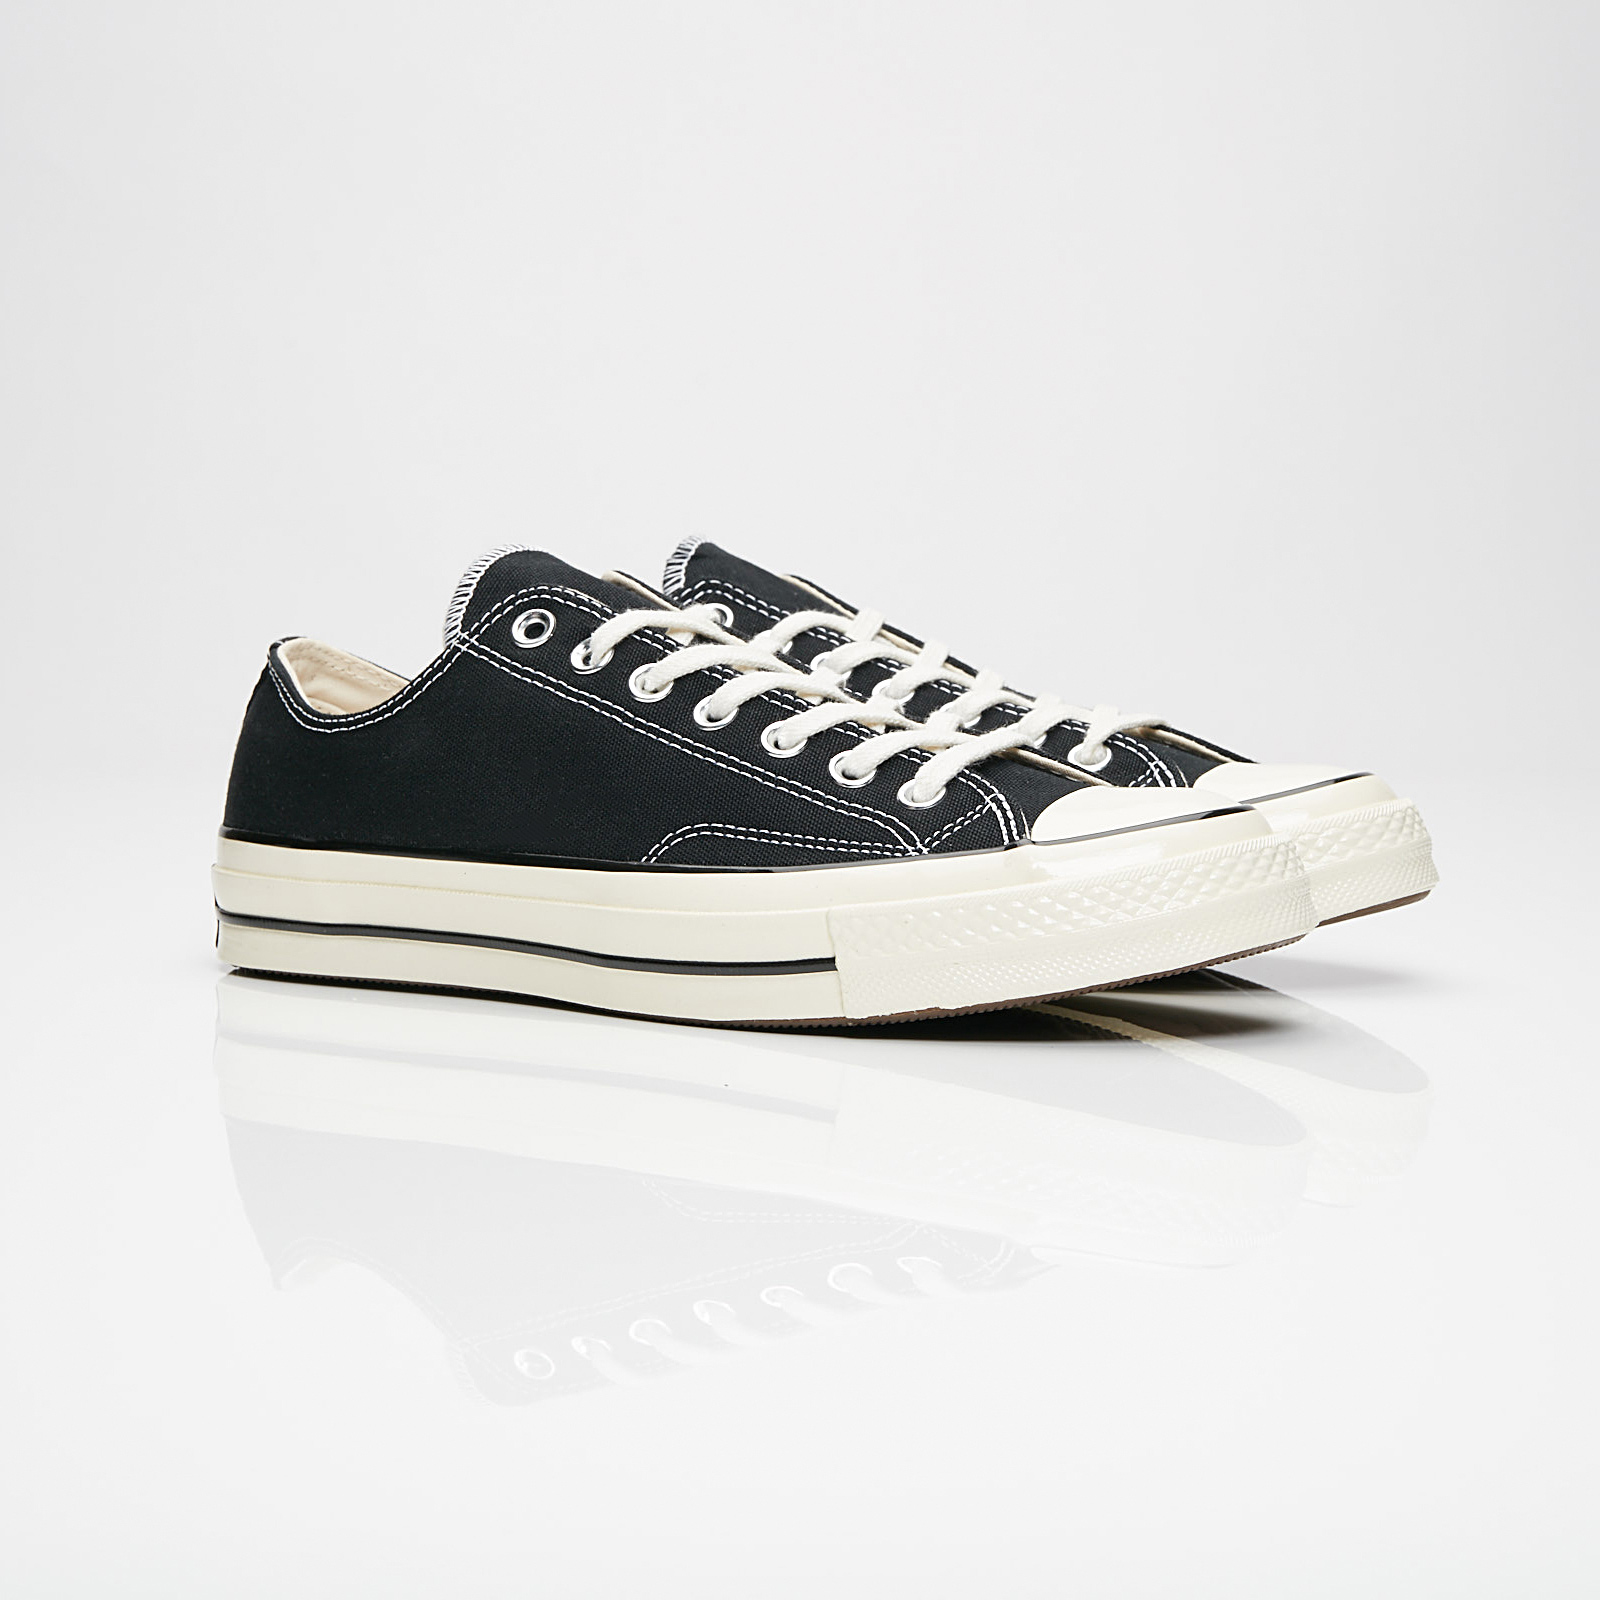 ef42b2c3ddb Converse Chuck 70 Ox - 162058c - Sneakersnstuff